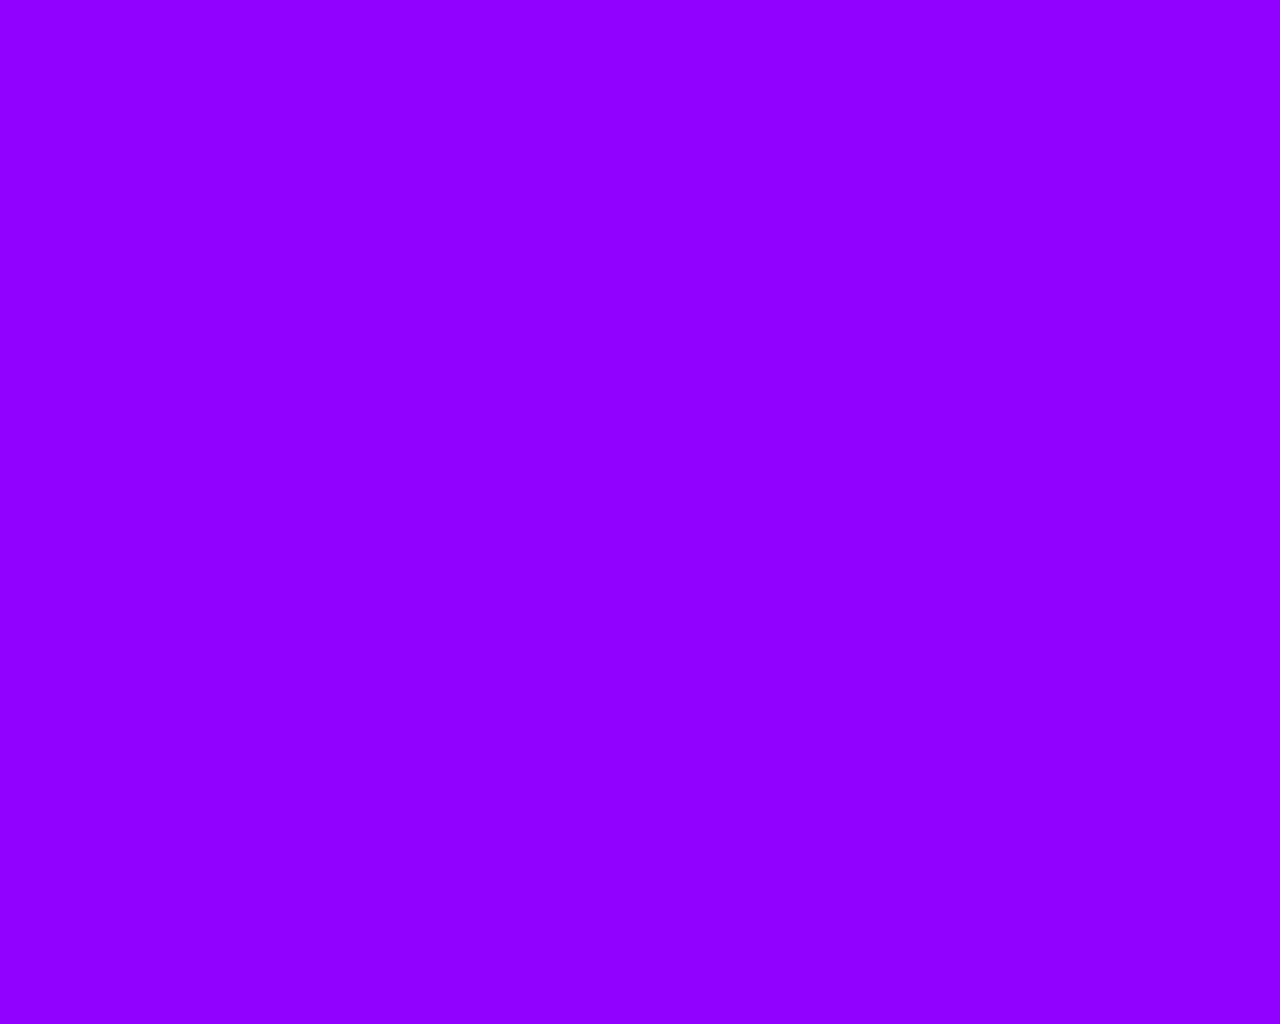 1280x1024 Electric Violet Solid Color Background